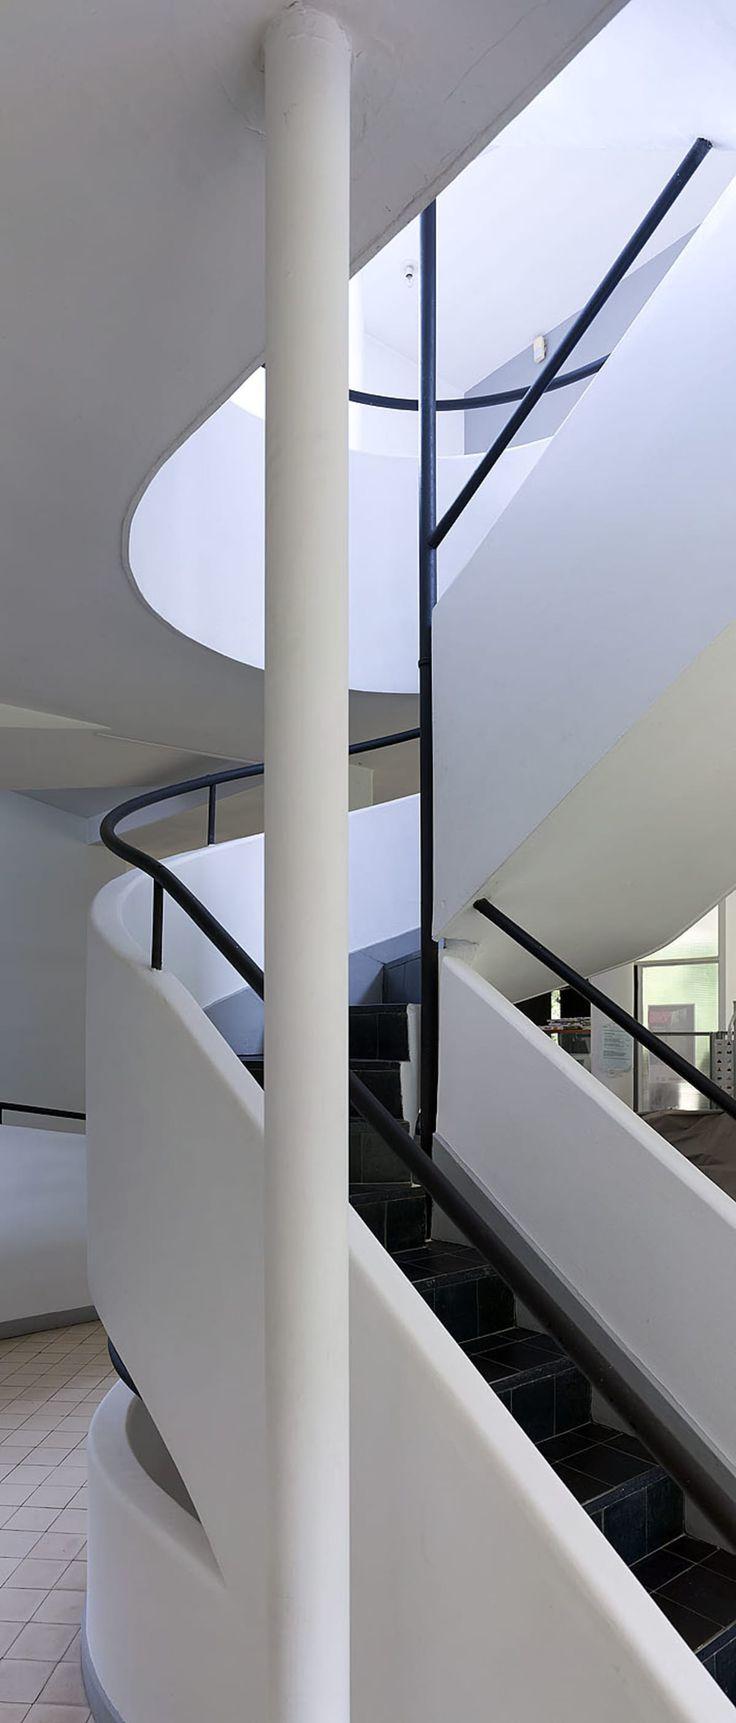 Le corbusier villa savoye interior - Le Corbusier Cemal Emden Villa Savoye